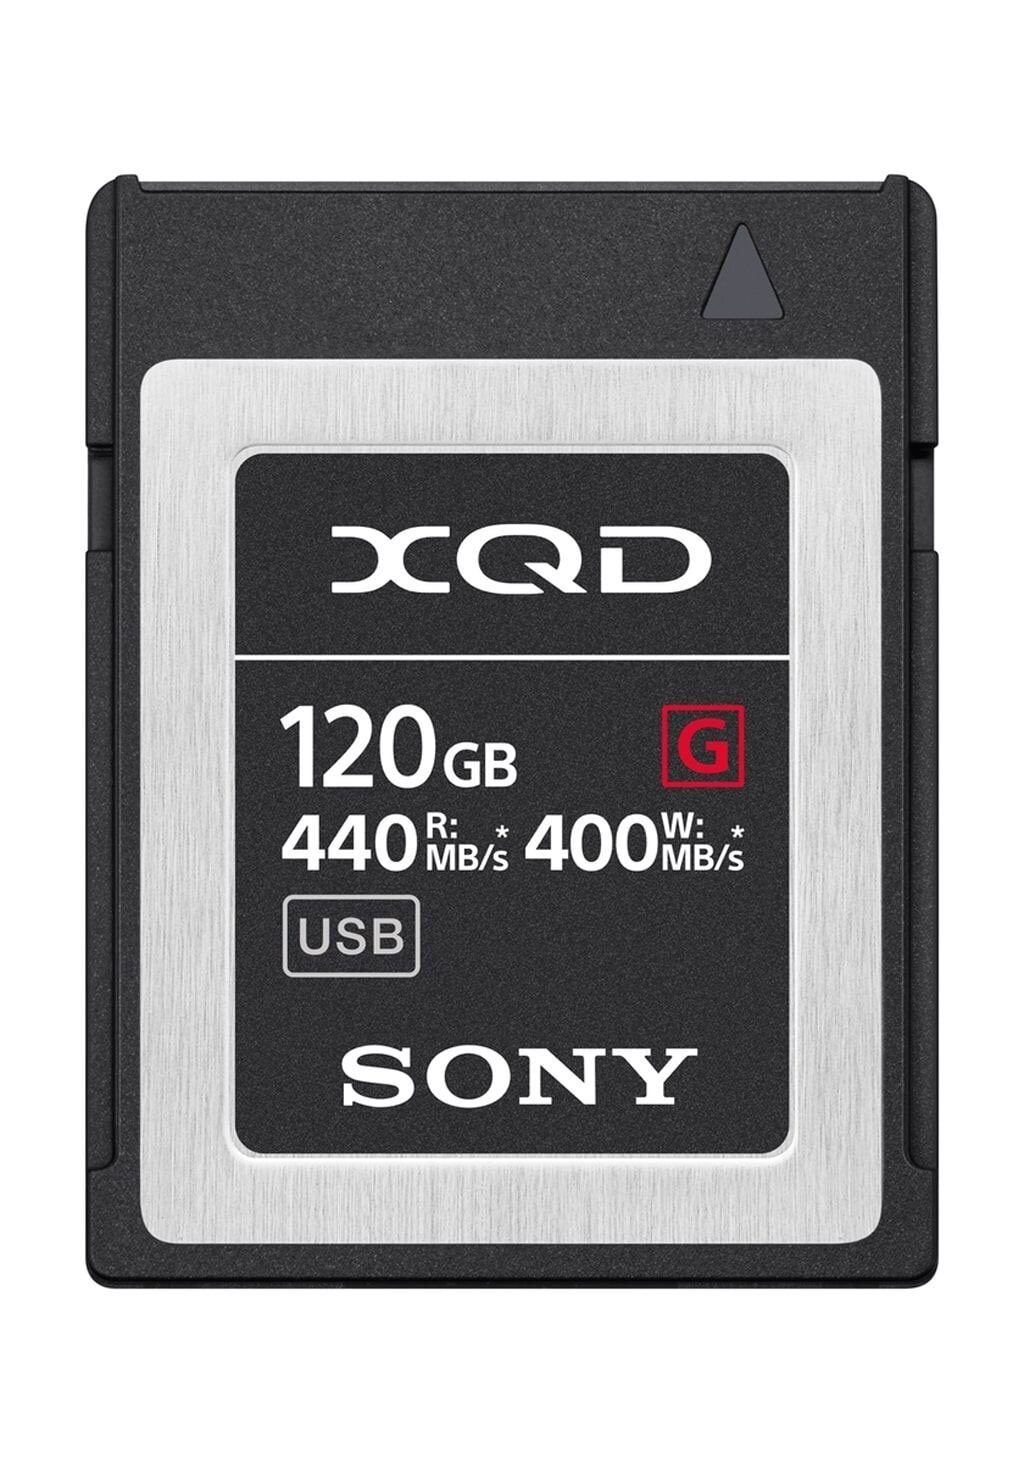 Sony XQD 120GB G-Serie (400/440MB/s) Speicherkarte